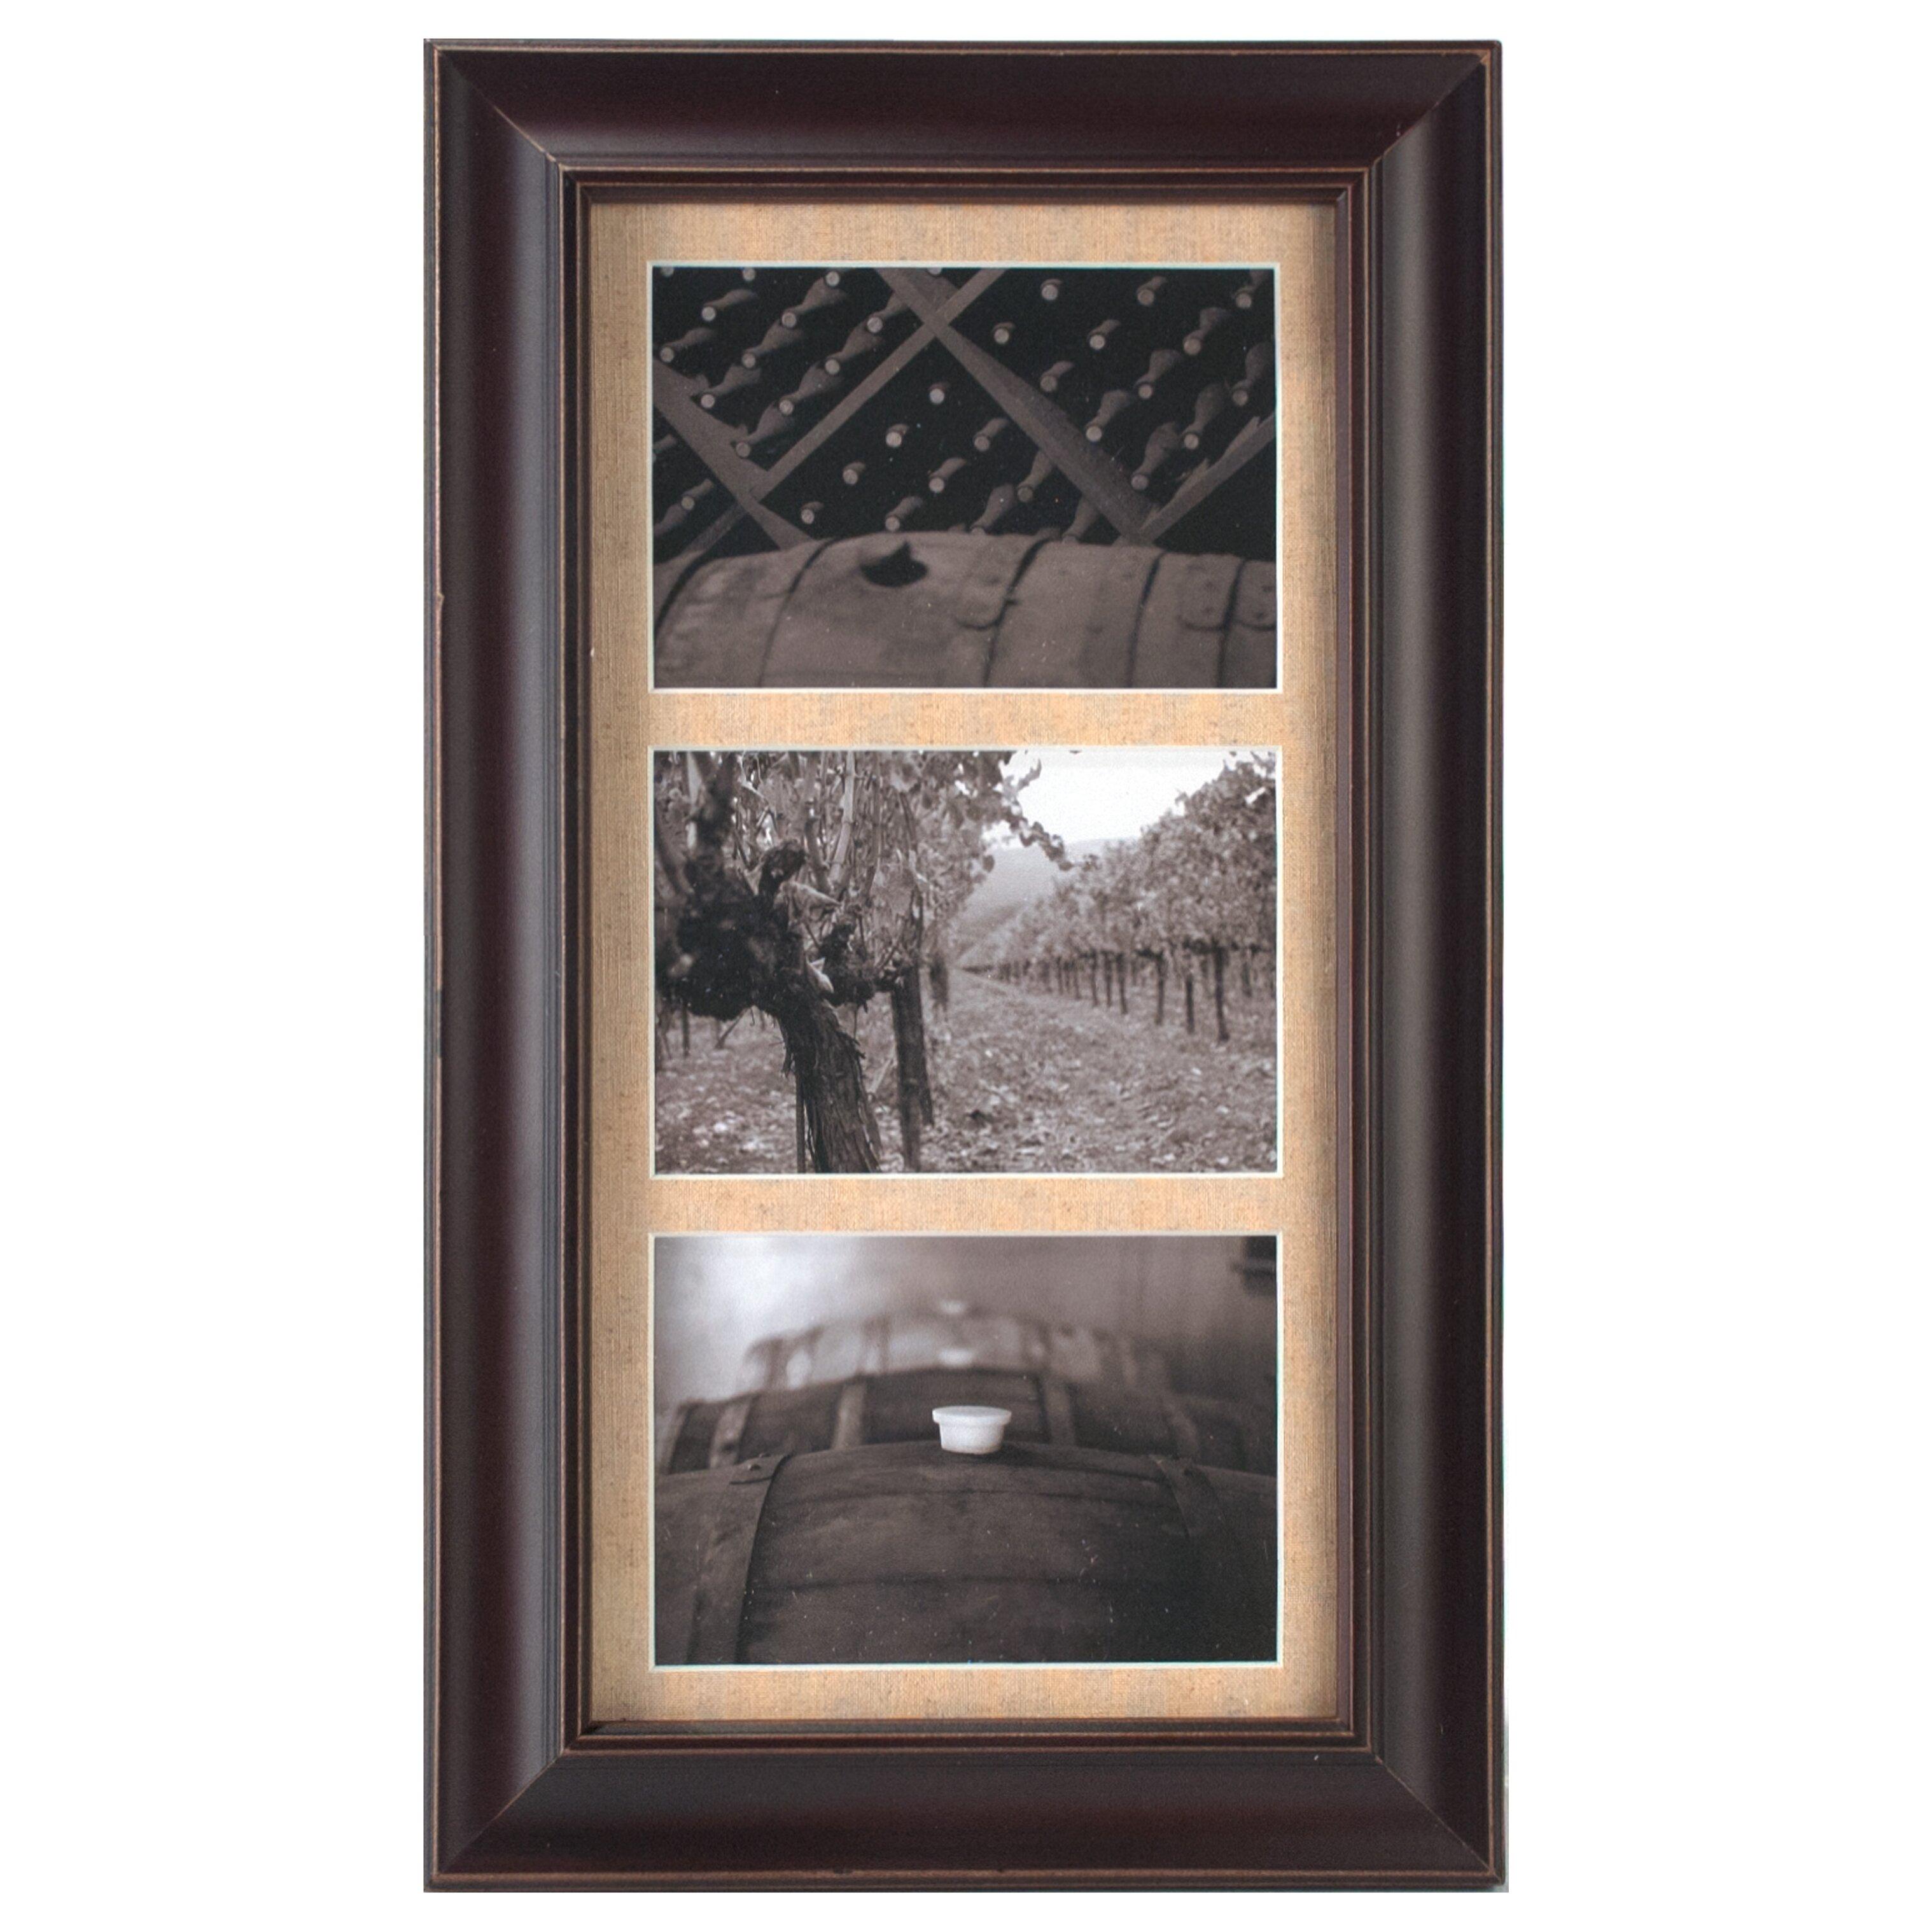 malden 3 opening 5 x 7 picture frame reviews wayfair. Black Bedroom Furniture Sets. Home Design Ideas